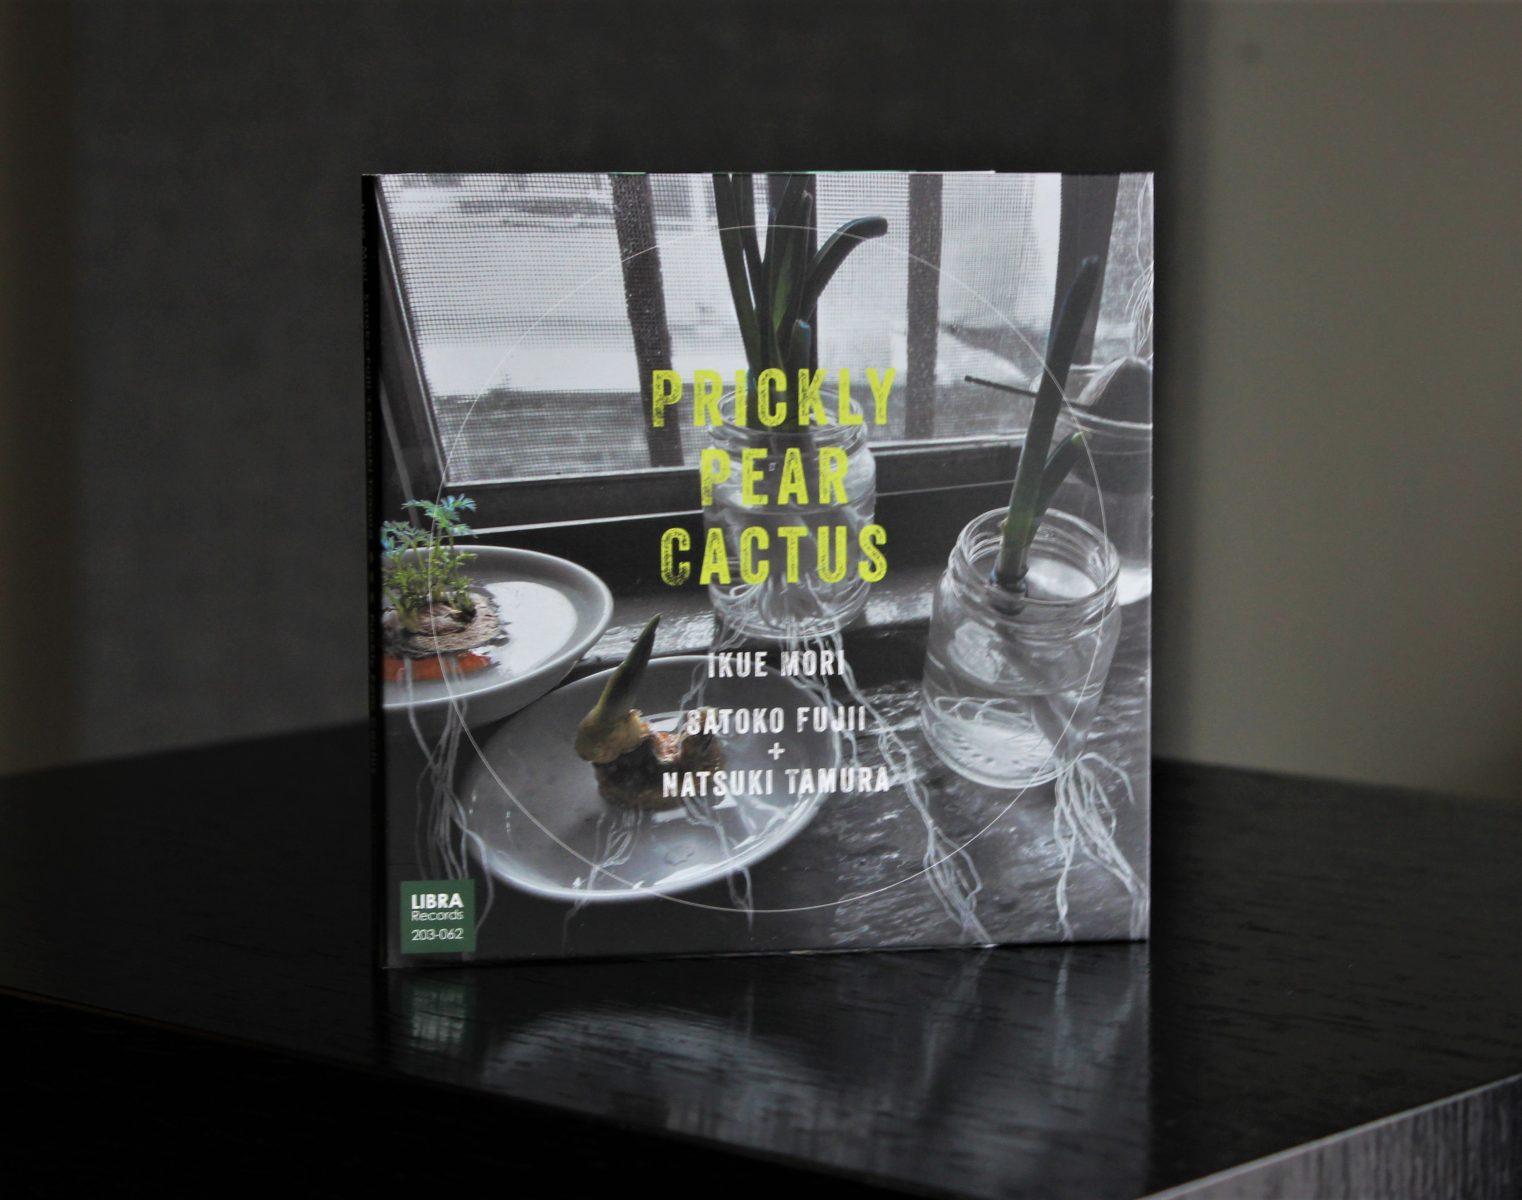 Ikue Mori, Satoko Fujii and Natsuki Tamura, Prickly Pear Cactus | The Vinyl Anachronist